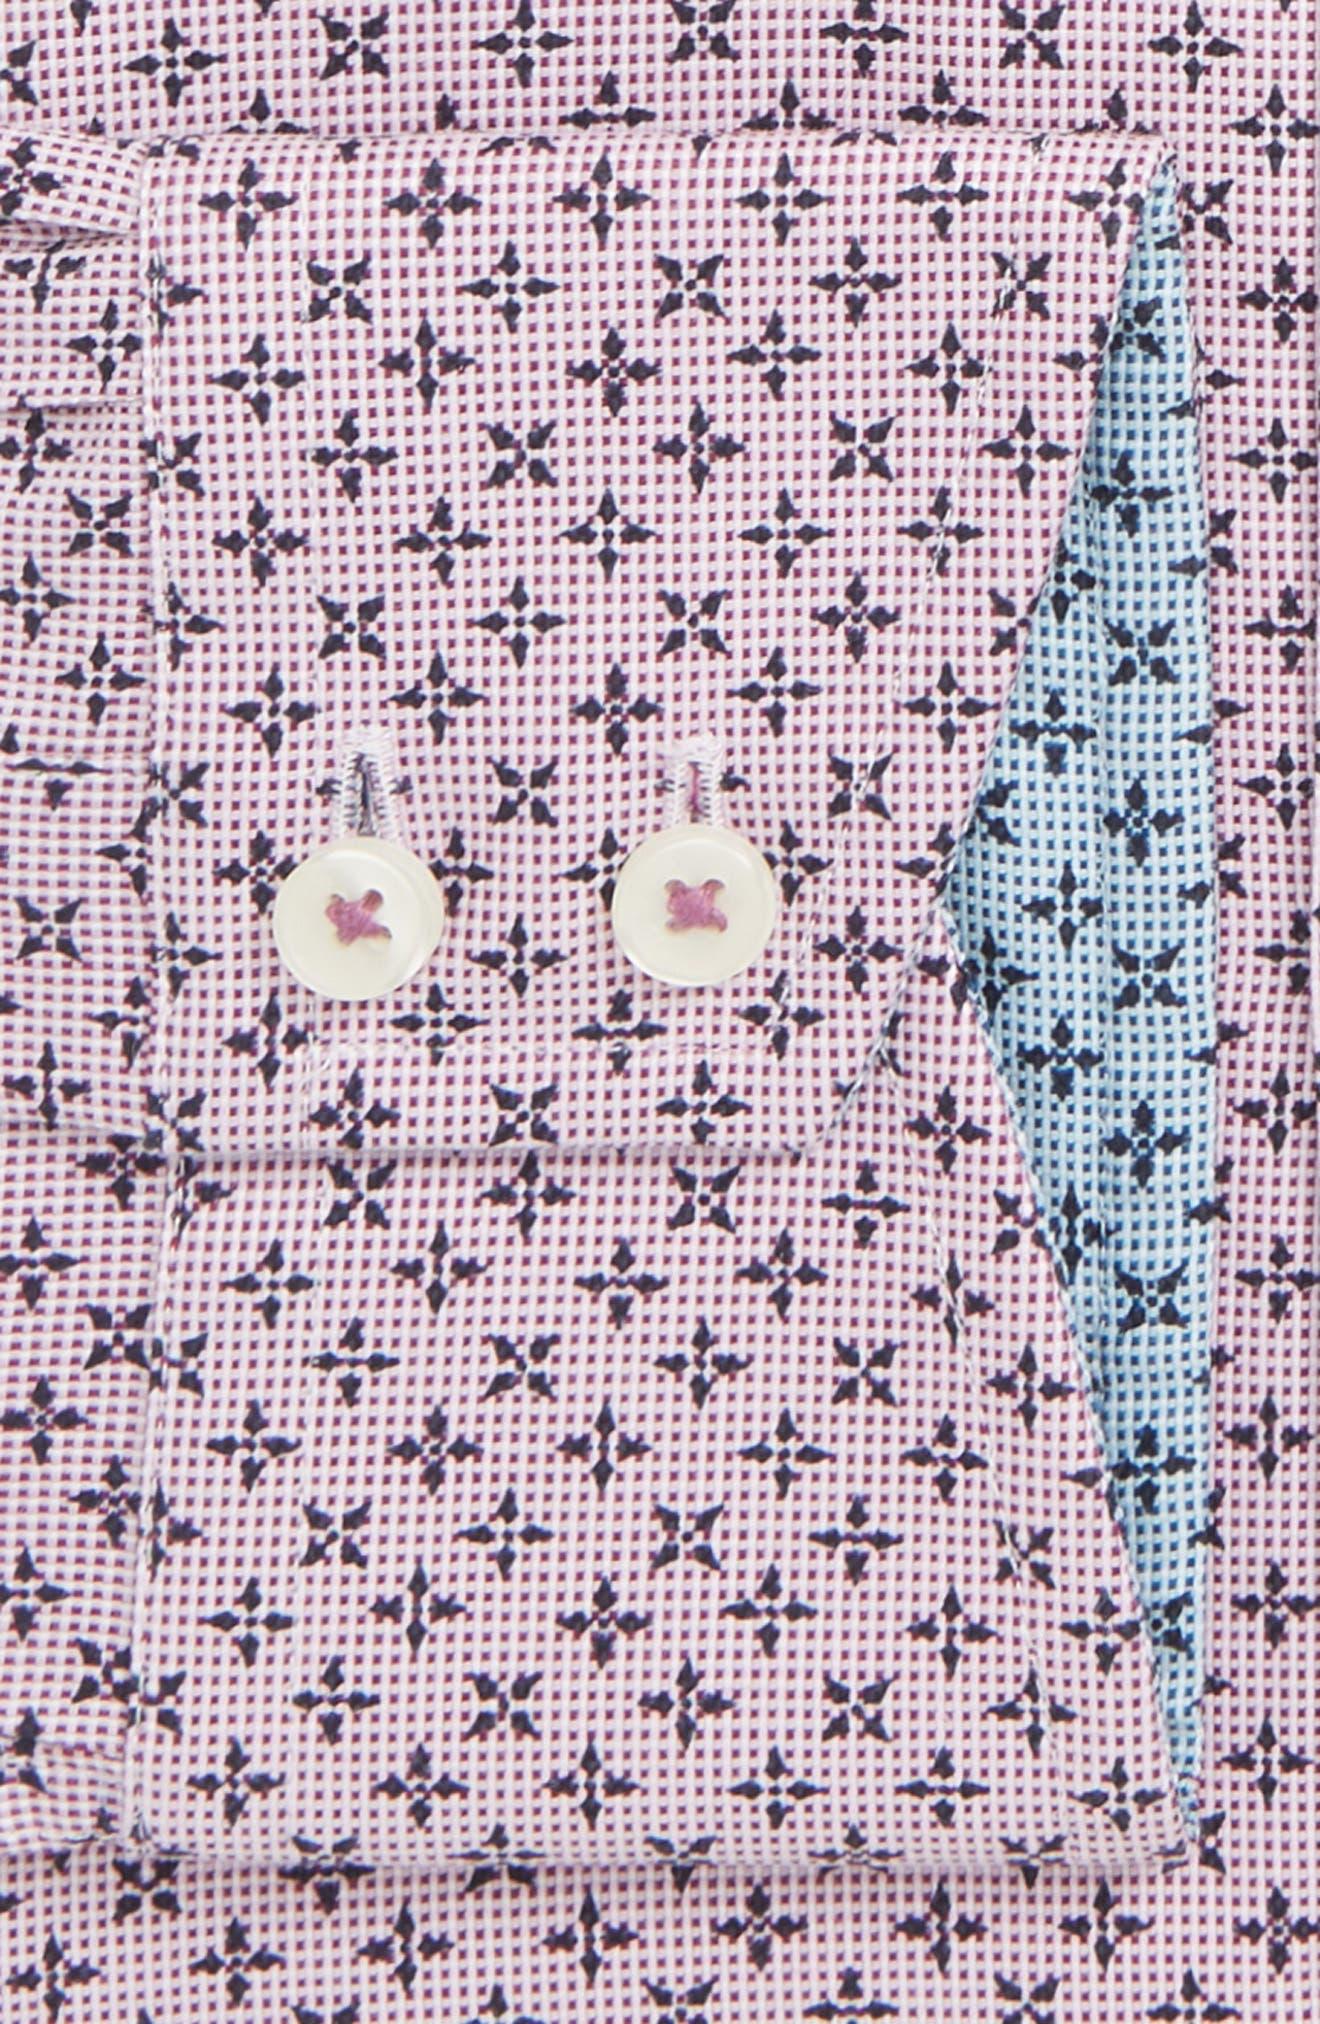 Bodder Trim Fit Print Dress Shirt,                             Alternate thumbnail 2, color,                             601